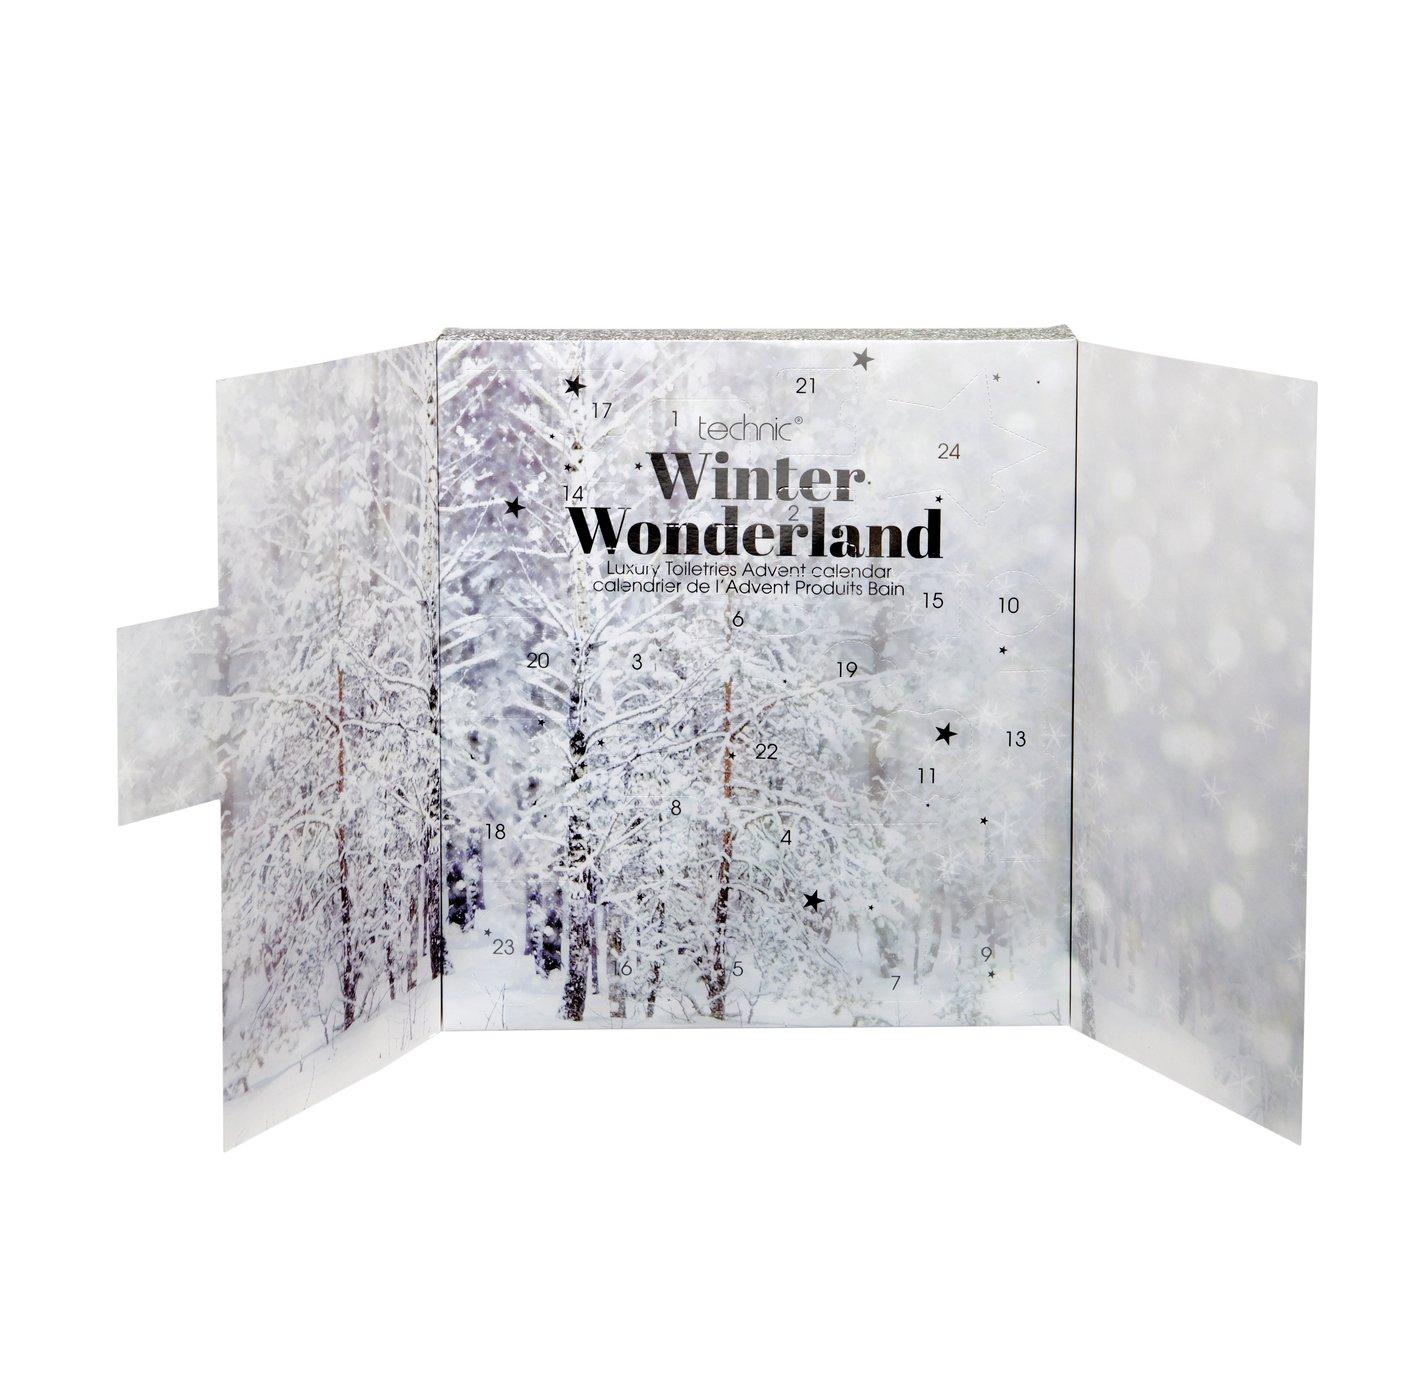 Technic Winter Wonderland 24 Day Luxury Advent Calendar £9.99 at Argos